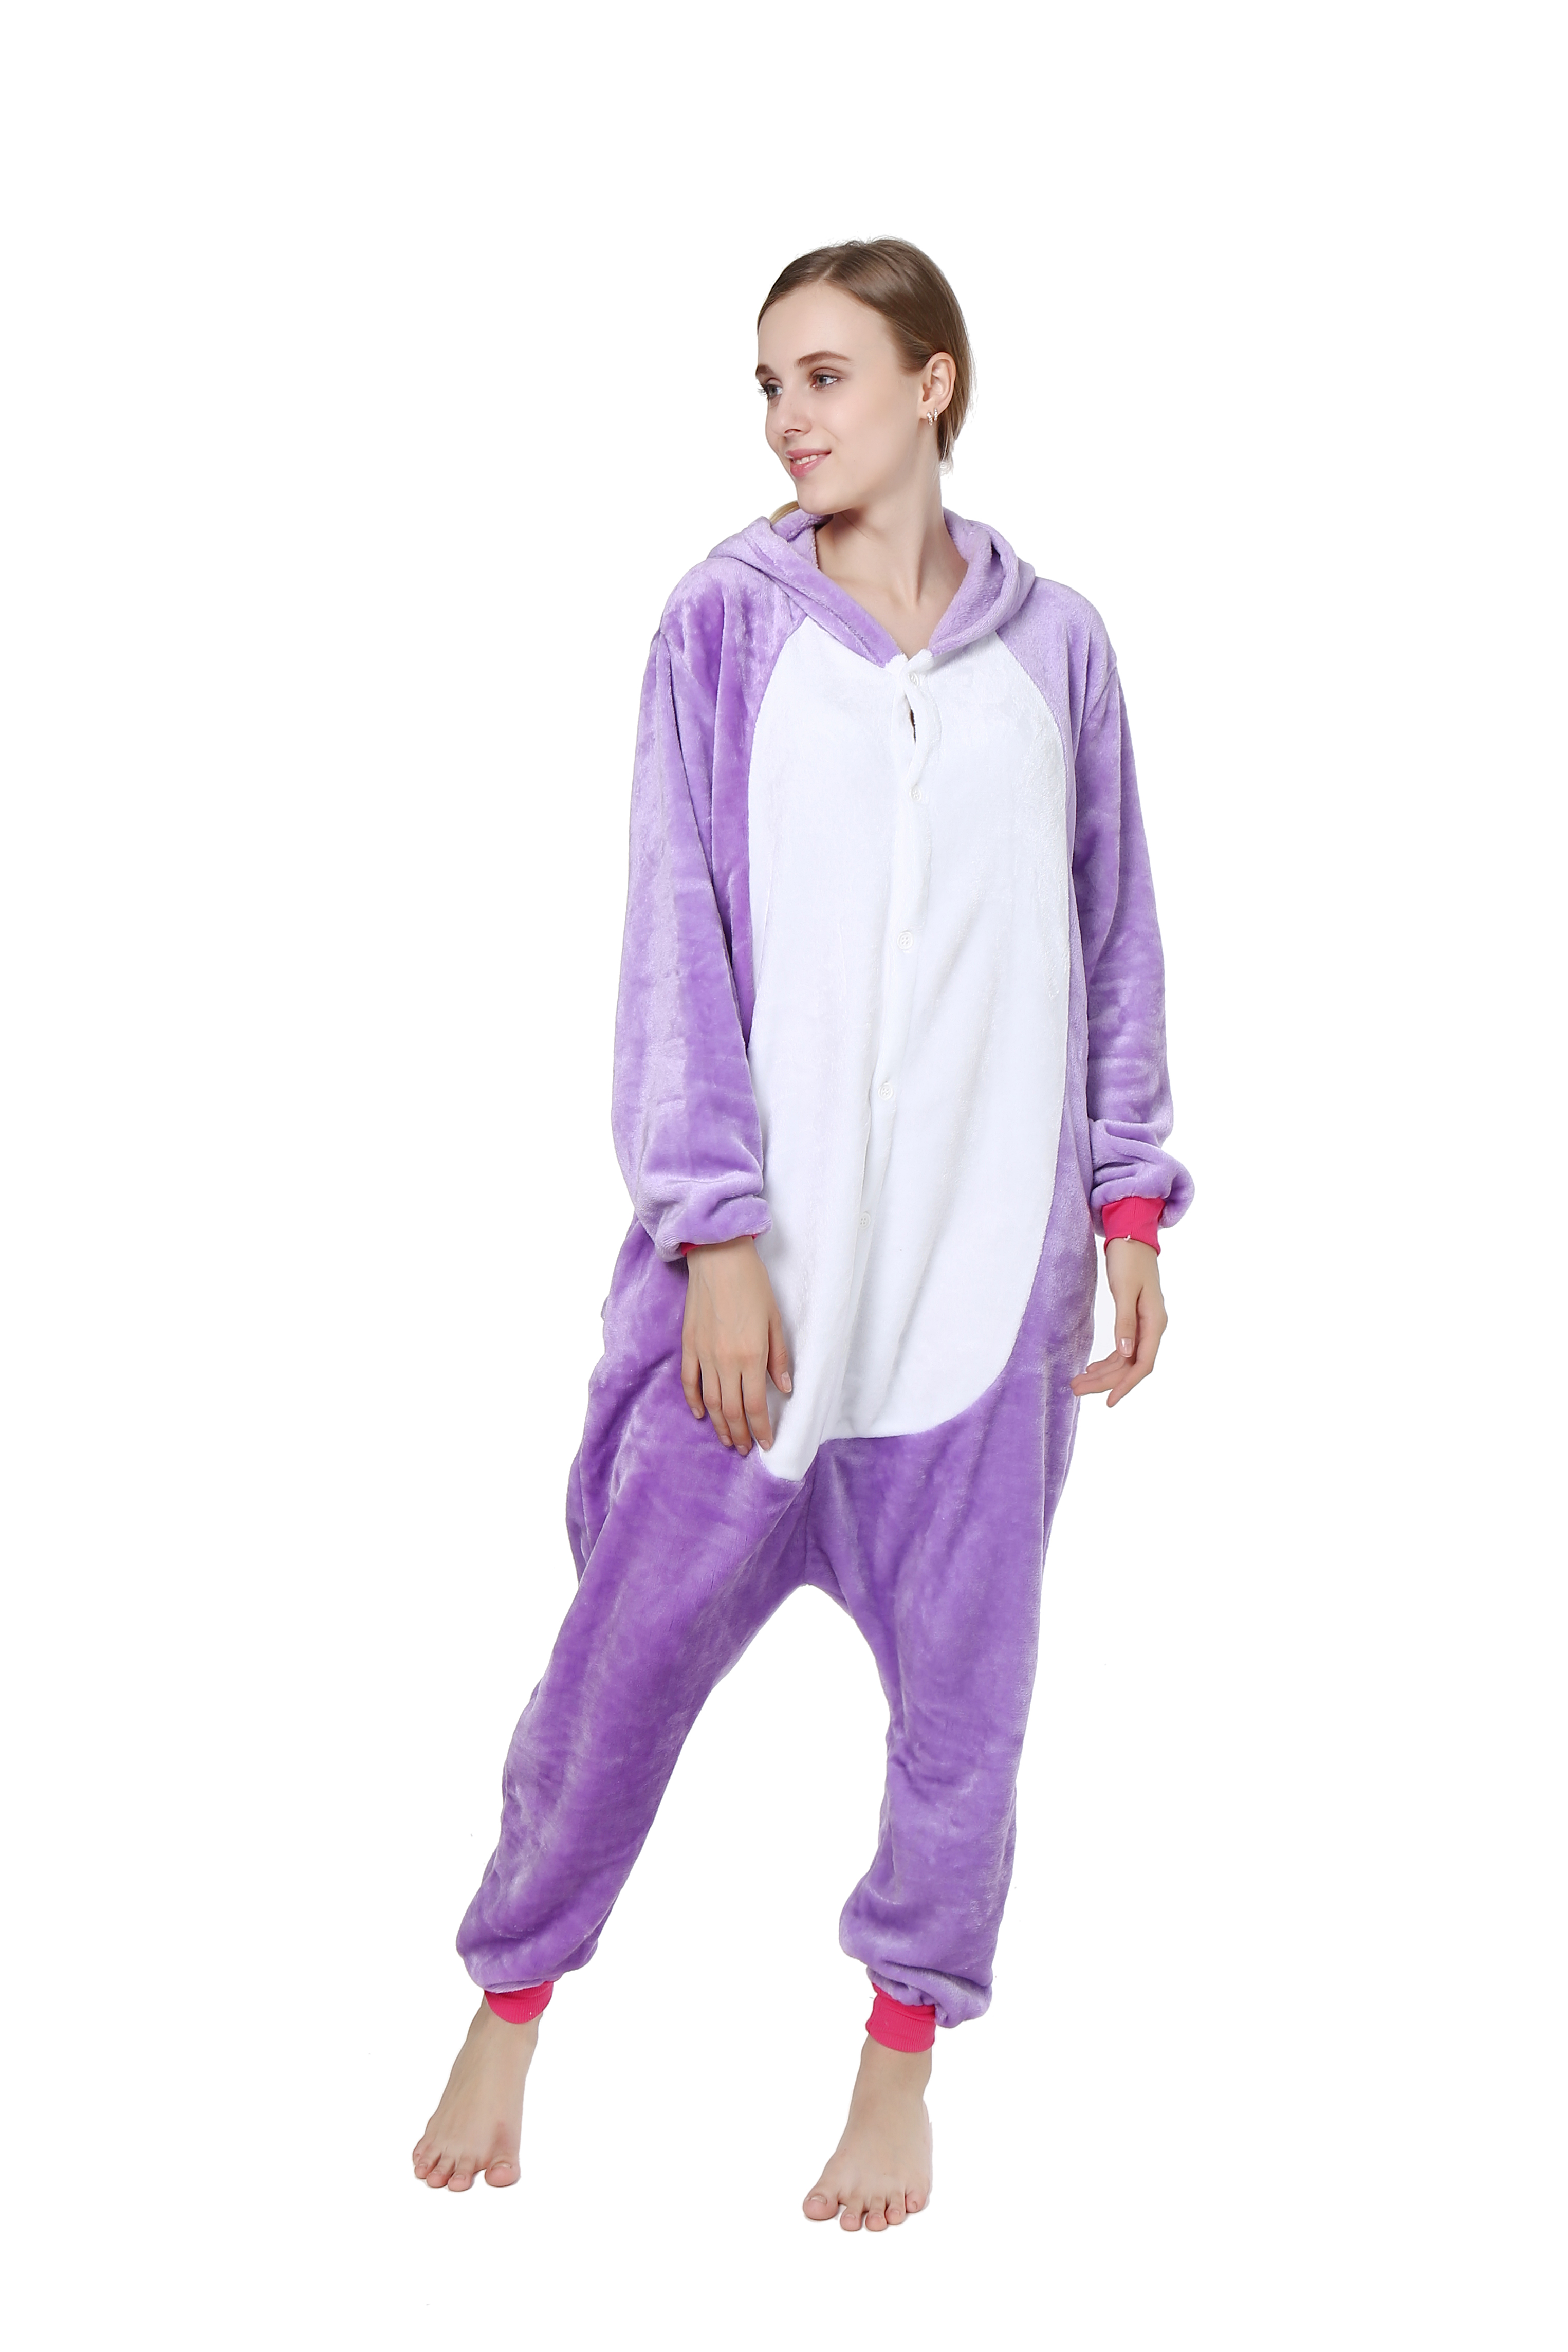 4bb7f0ef362b cheap Kigurumi Pajama Unicorn Onesie Pajamas Flannel Purple   Pink Cosplay  For Animal Sleepwear Cartoon Halloween